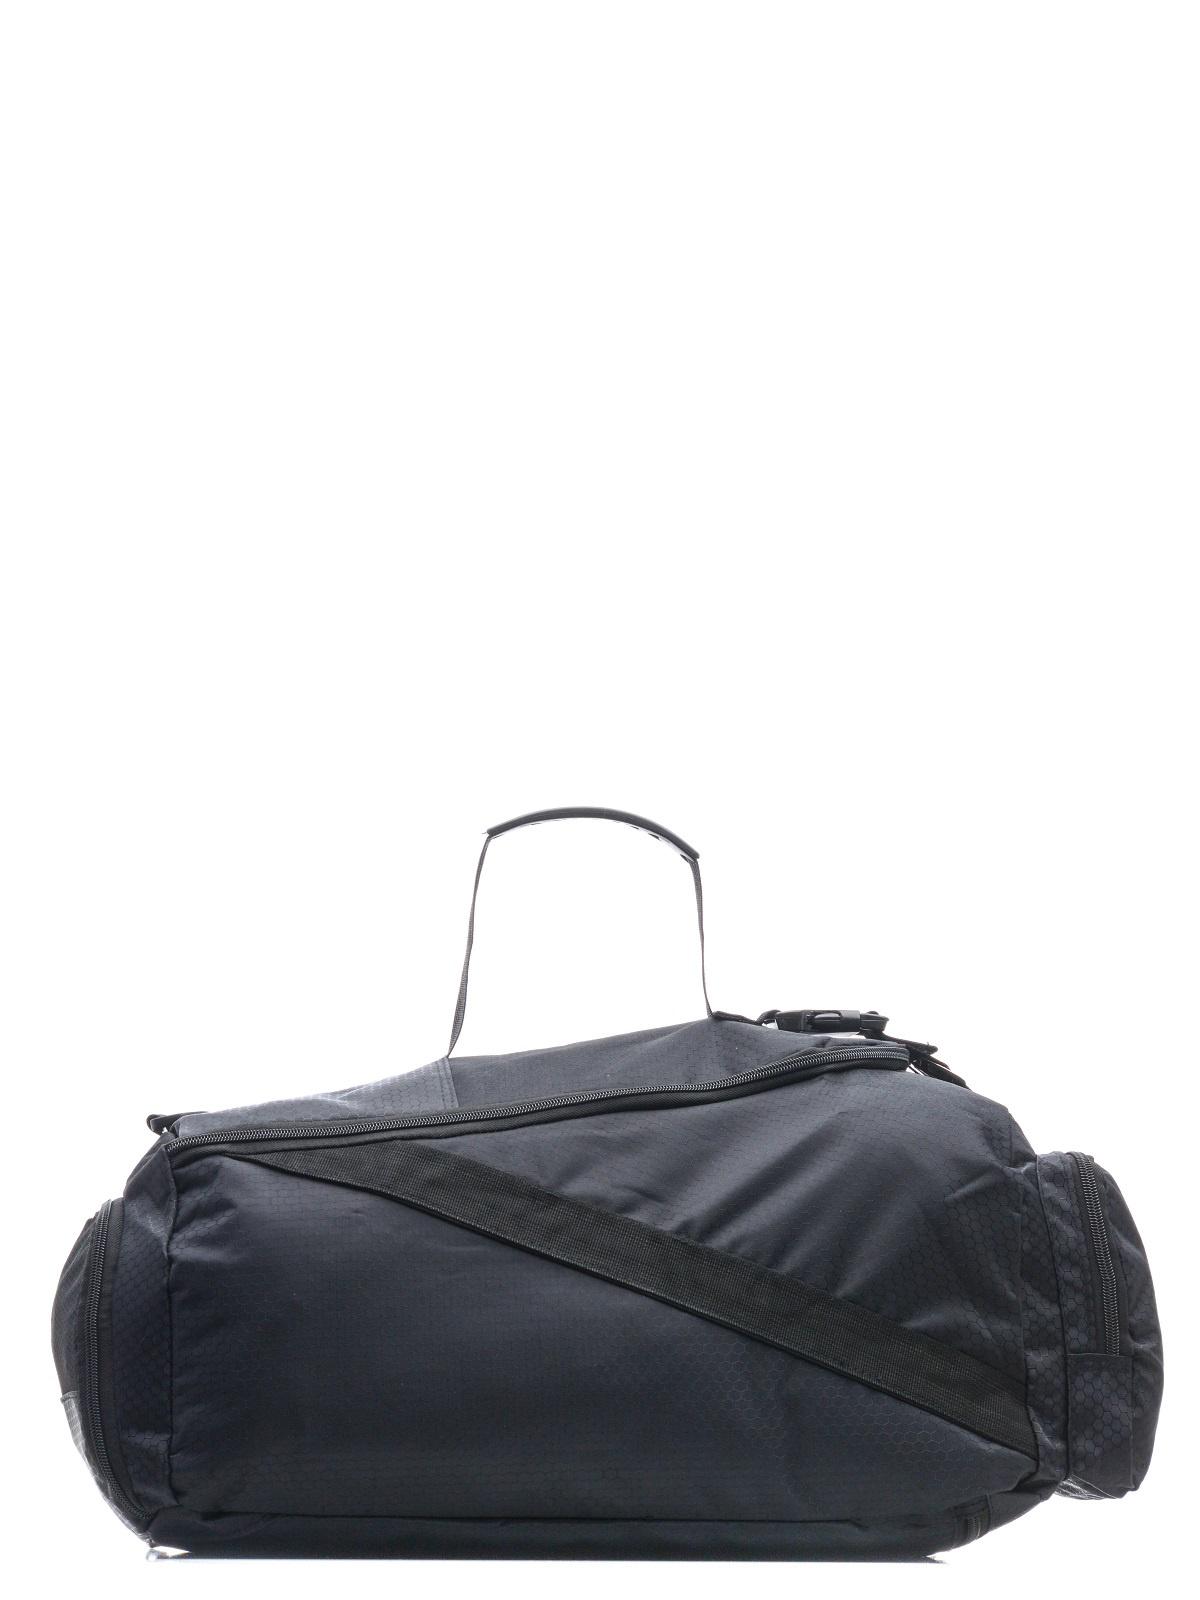 Сумка спортивная Athletic pro. сумка спортивная dakine roam duffle black